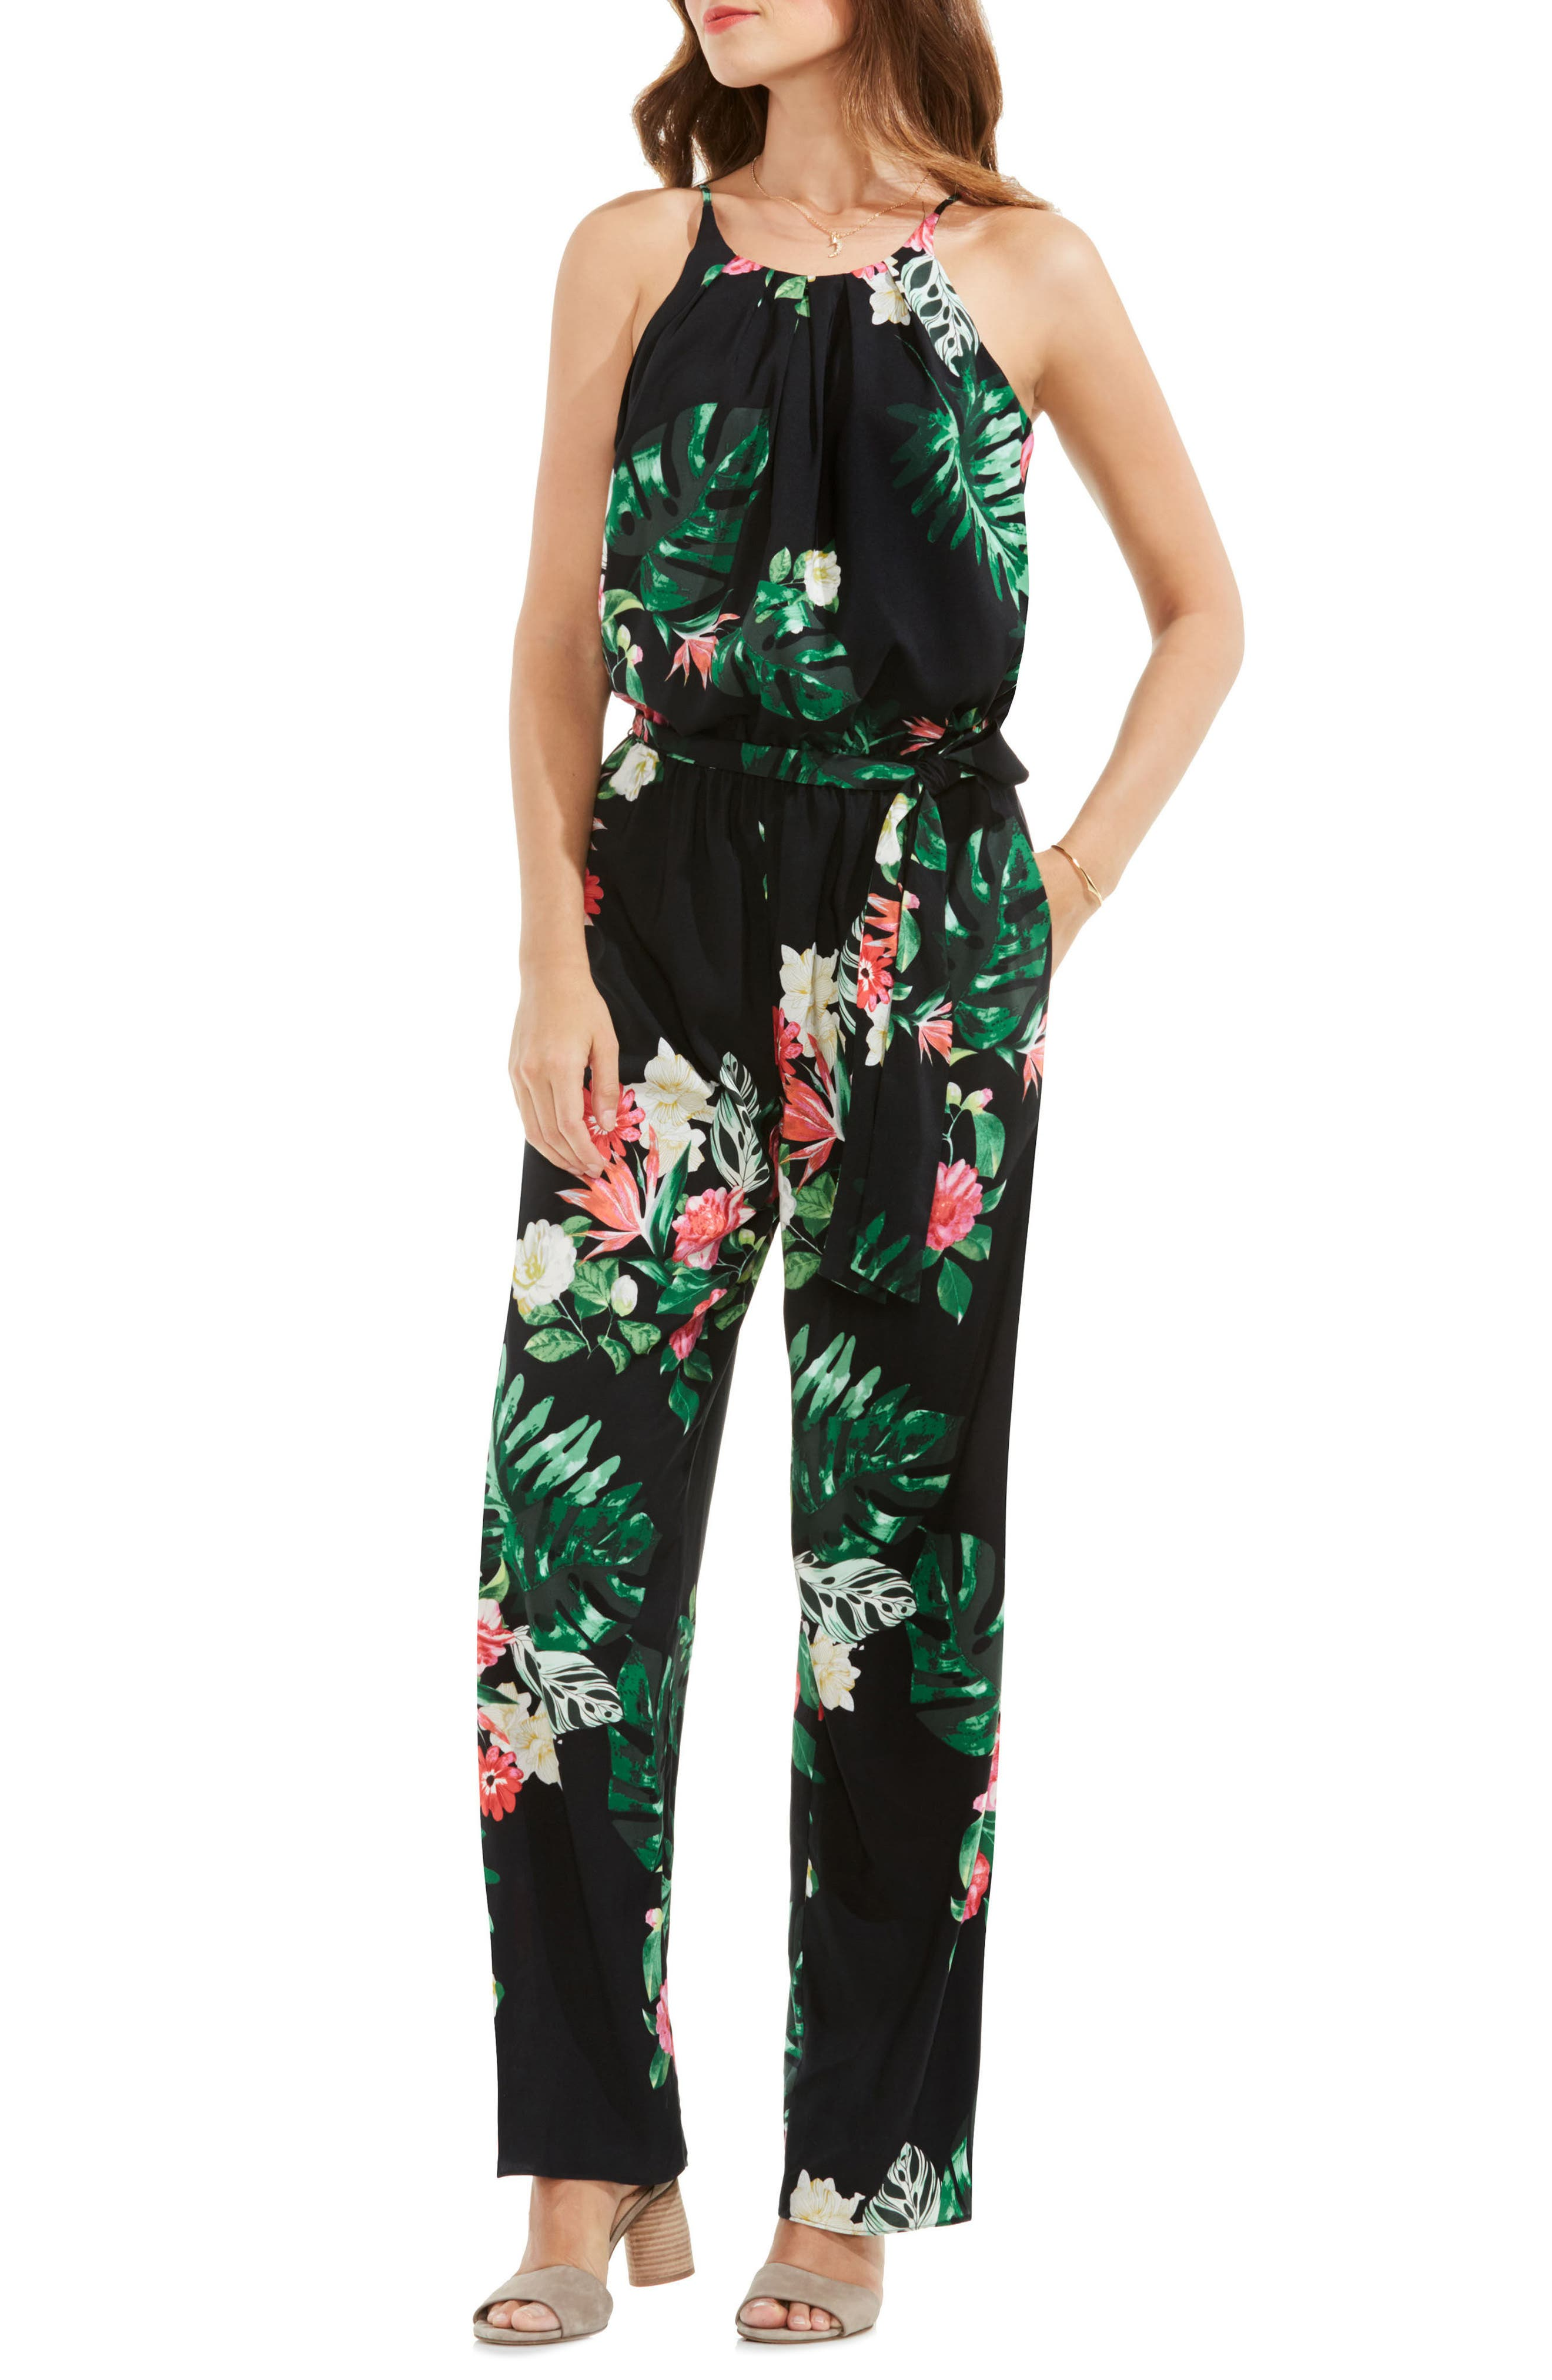 Alternate Image 1 Selected - Vince Camuto Havana Tropical Tie Waist Jumpsuit